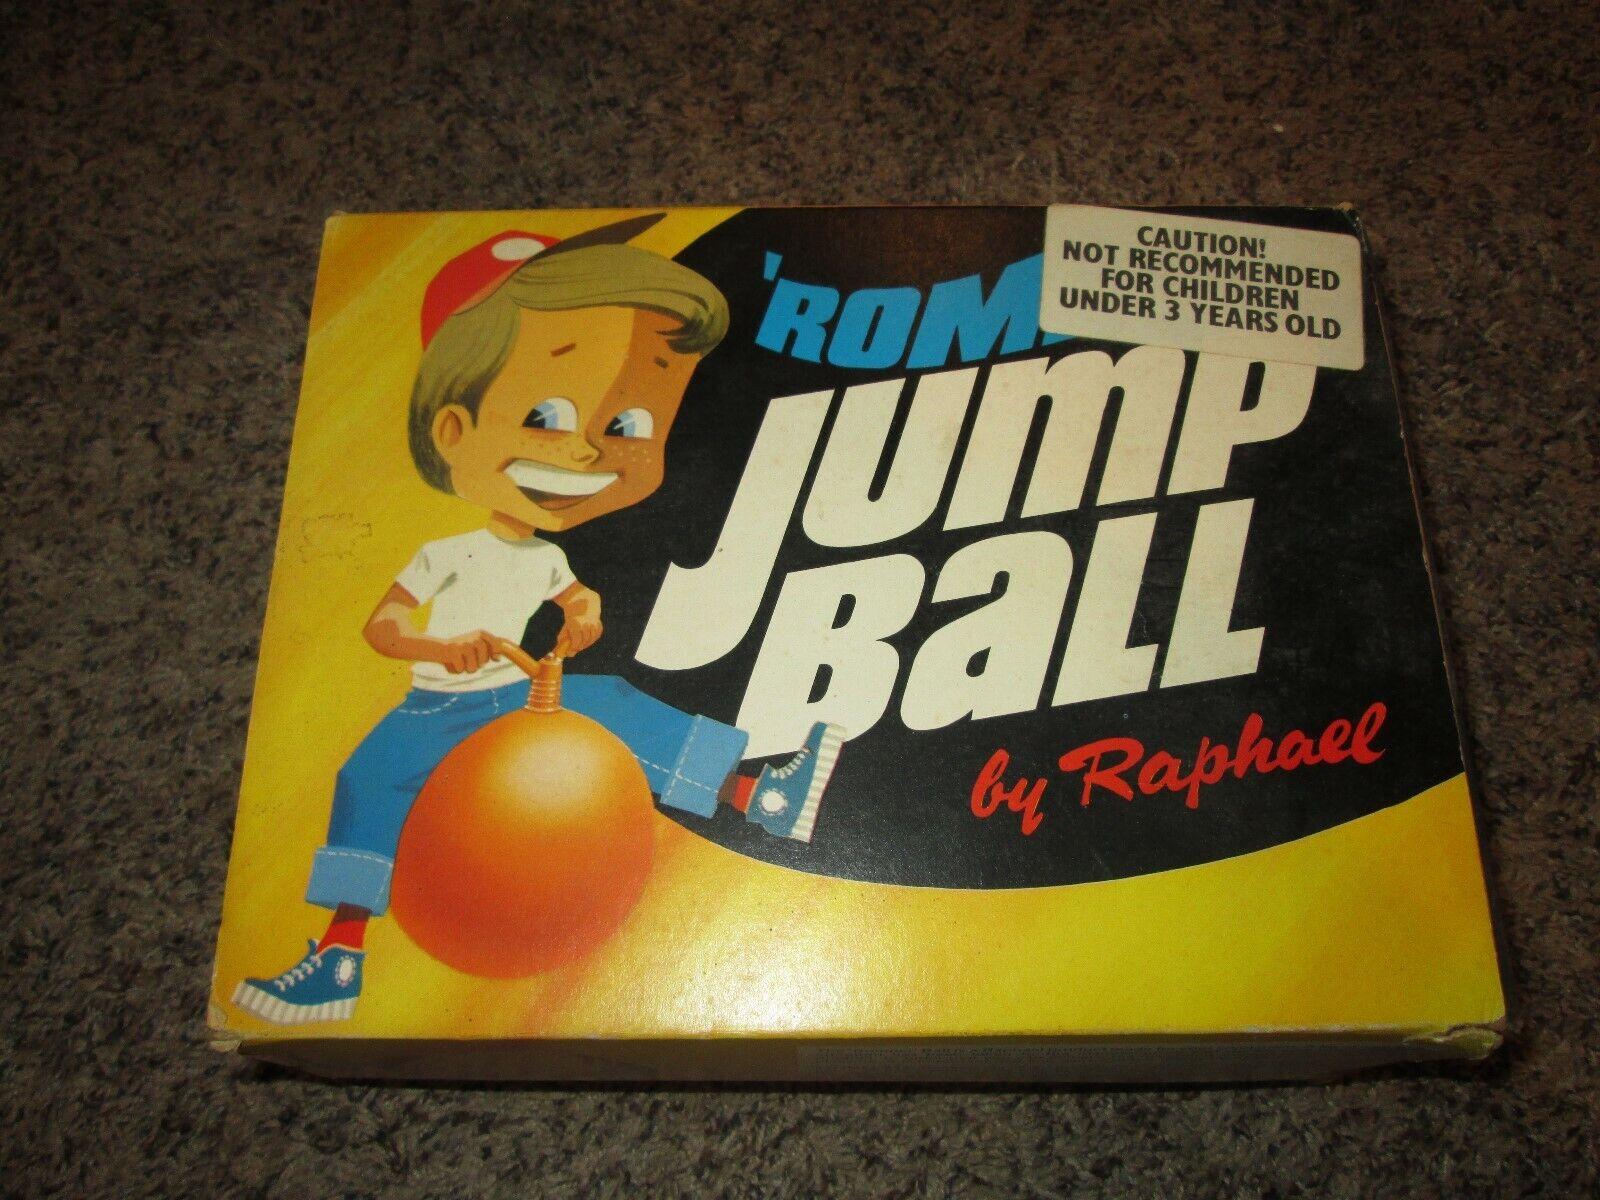 Vintage 1976 Romper Jumpbtutti by Raphael NOS wscatola